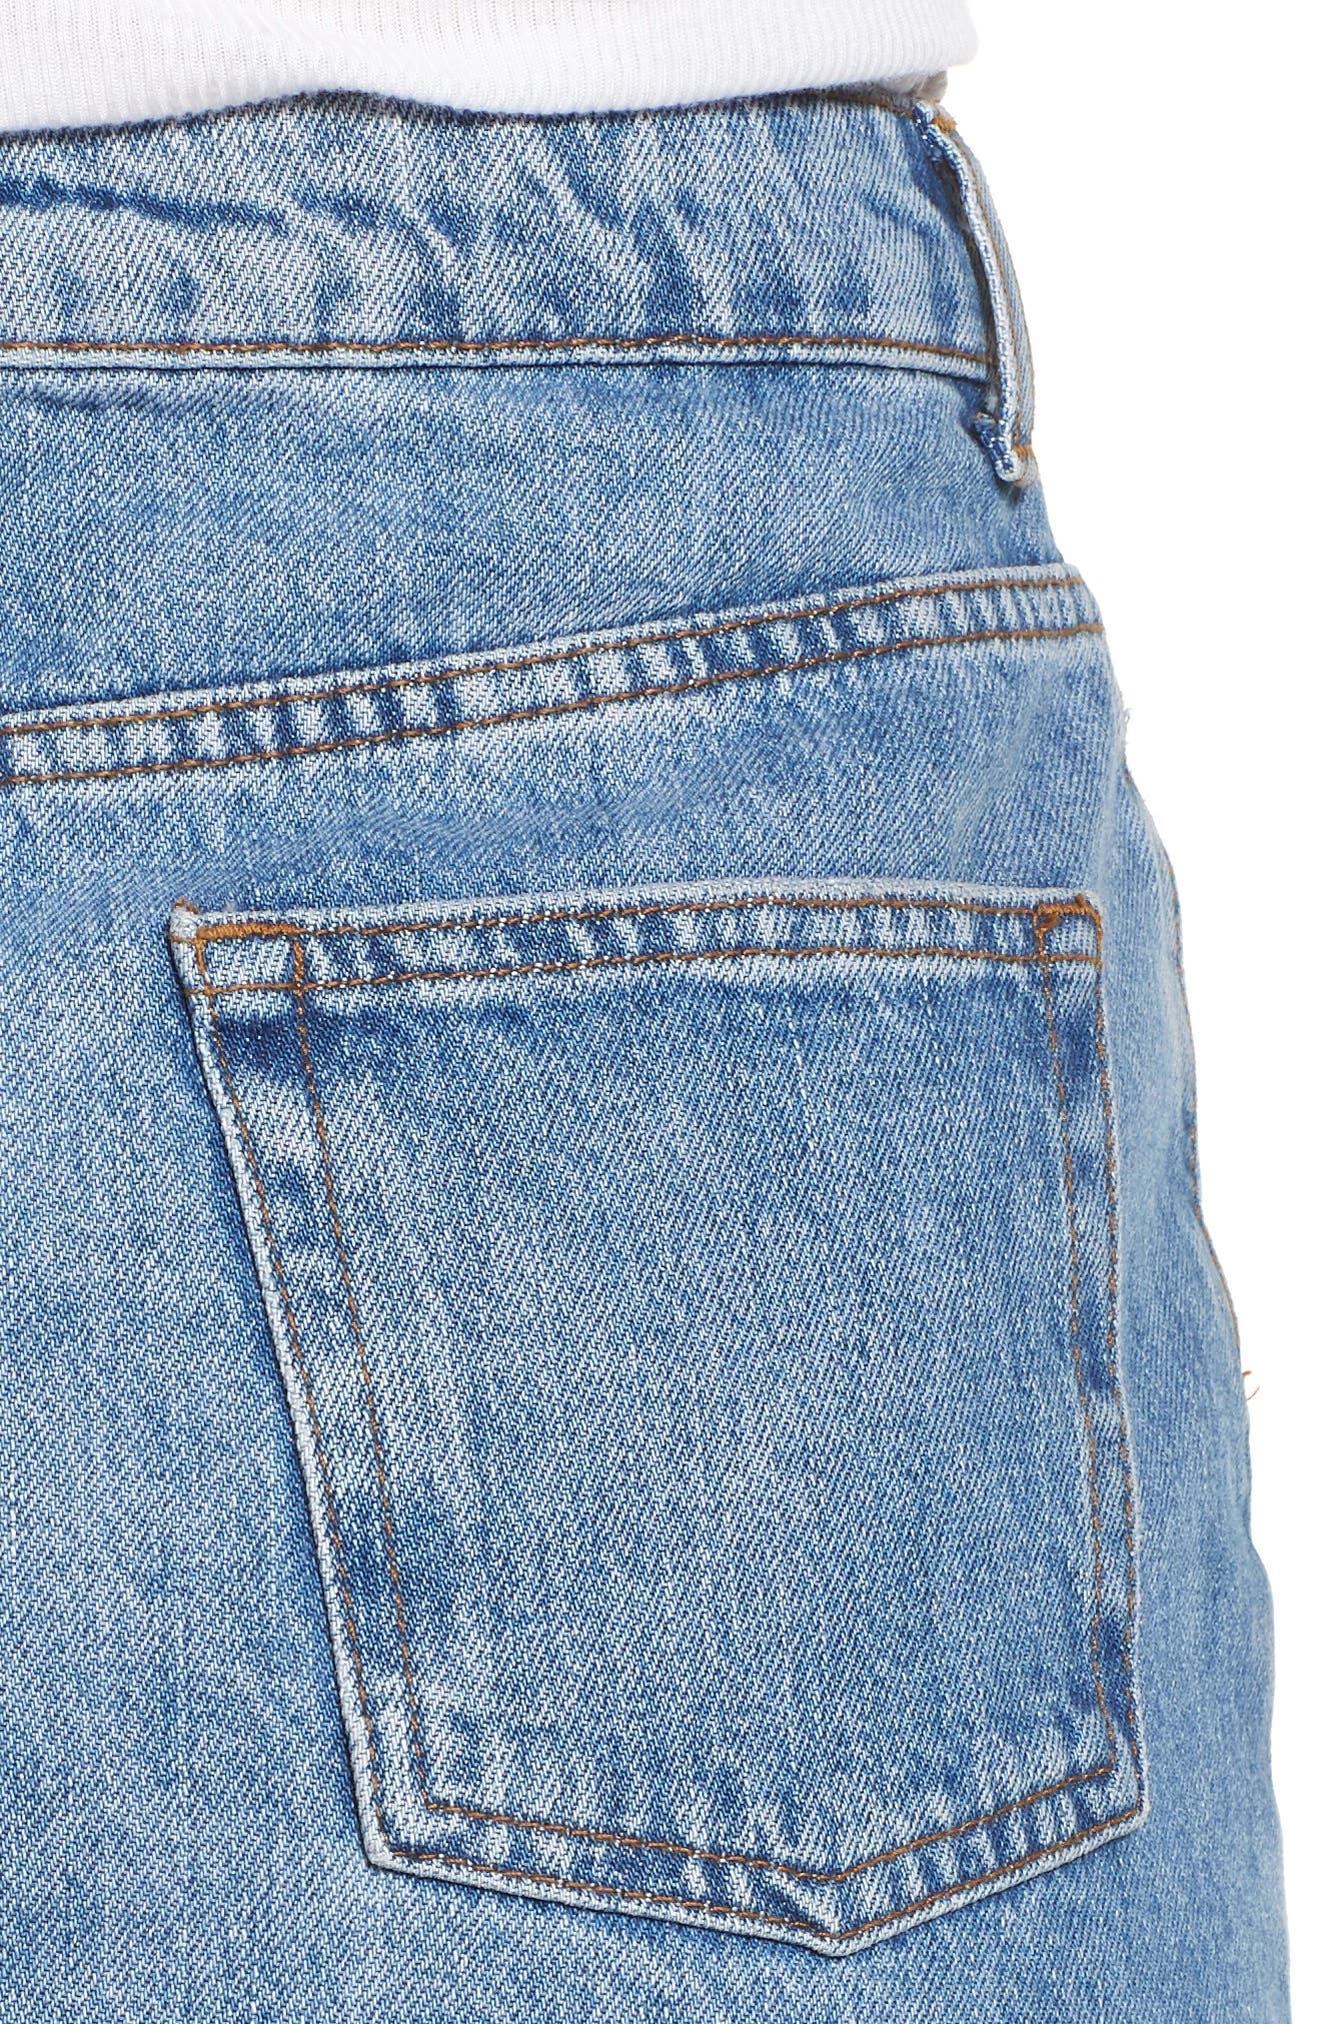 TOPSHOP, Denim Miniskirt, Alternate thumbnail 5, color, MID DENIM